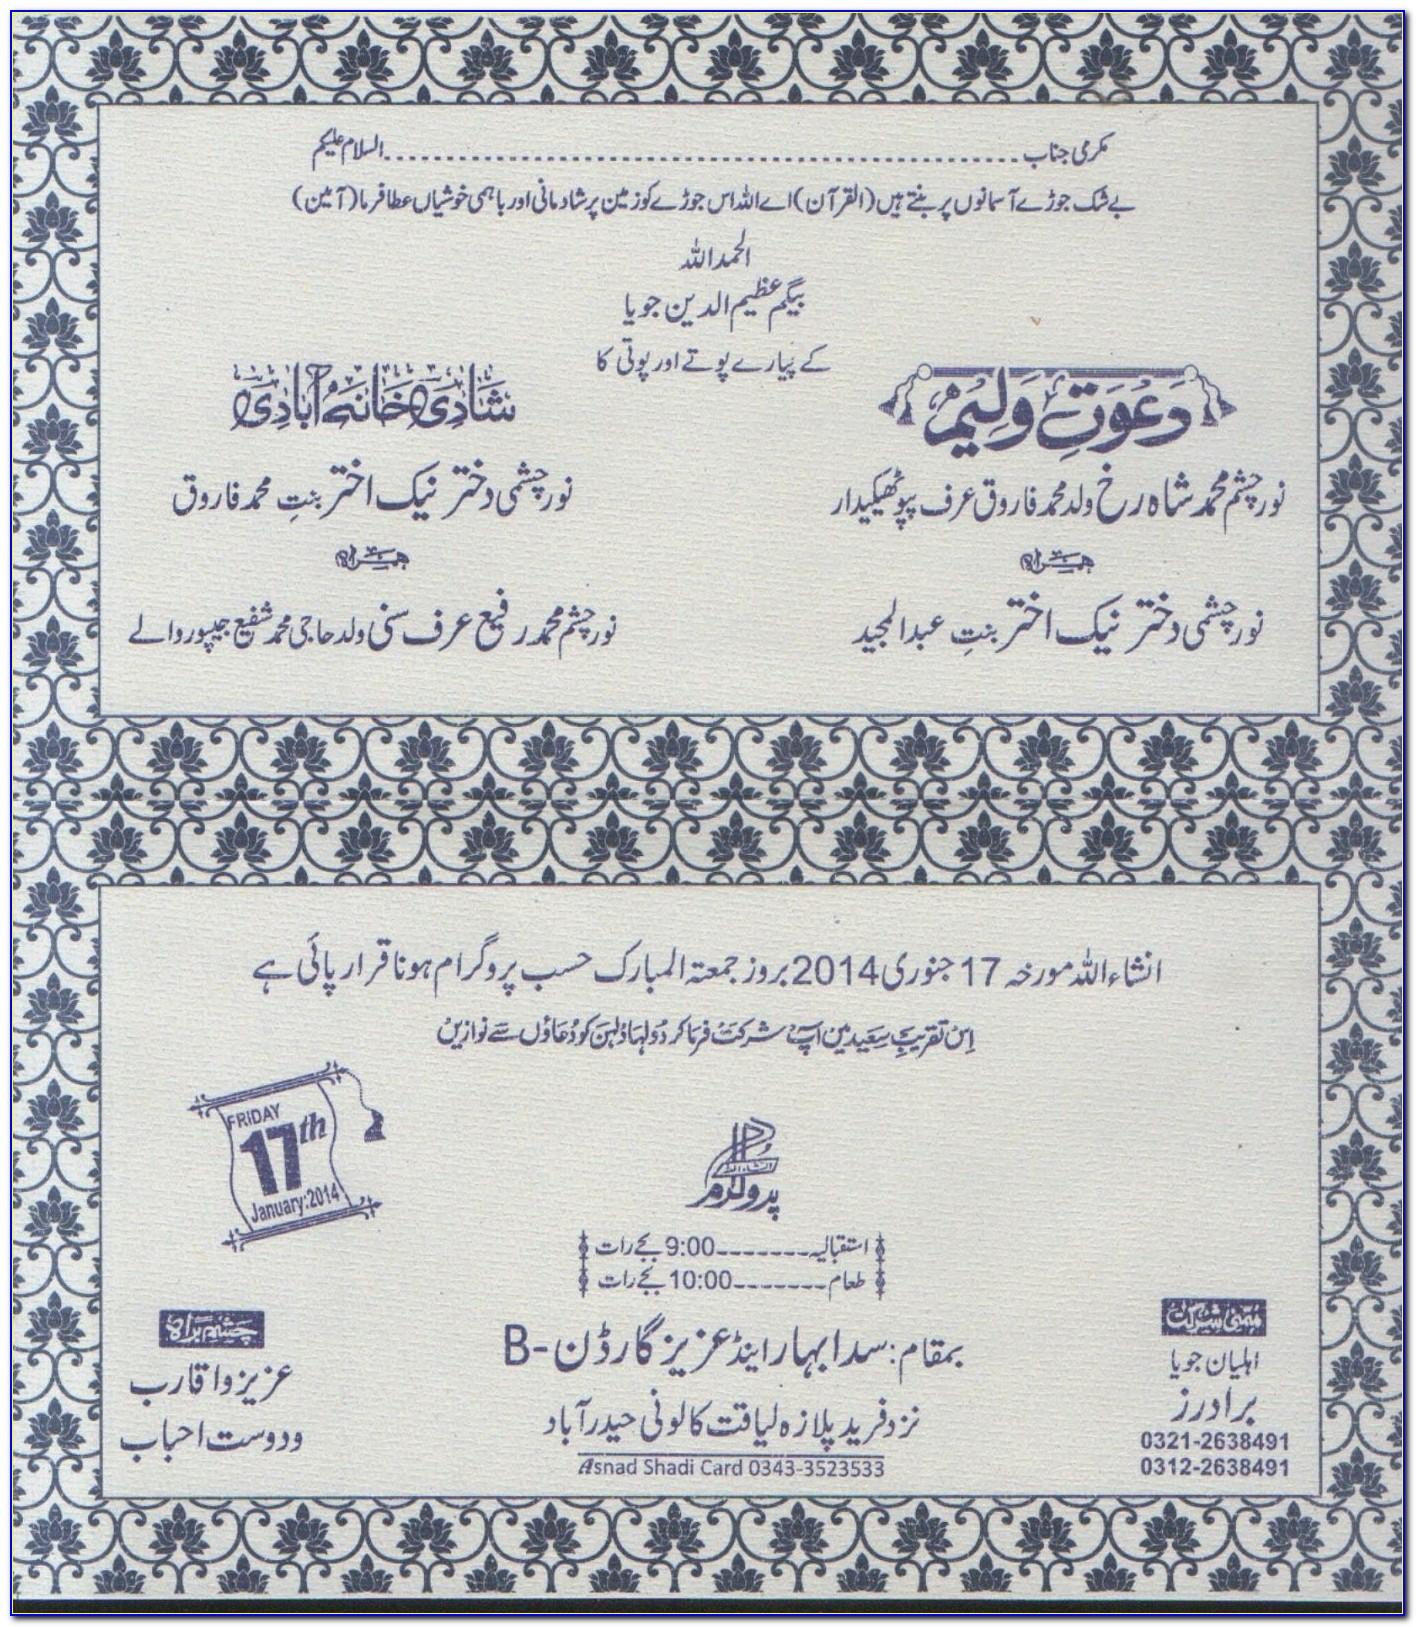 Pakistani Wedding Card Text In Urdu